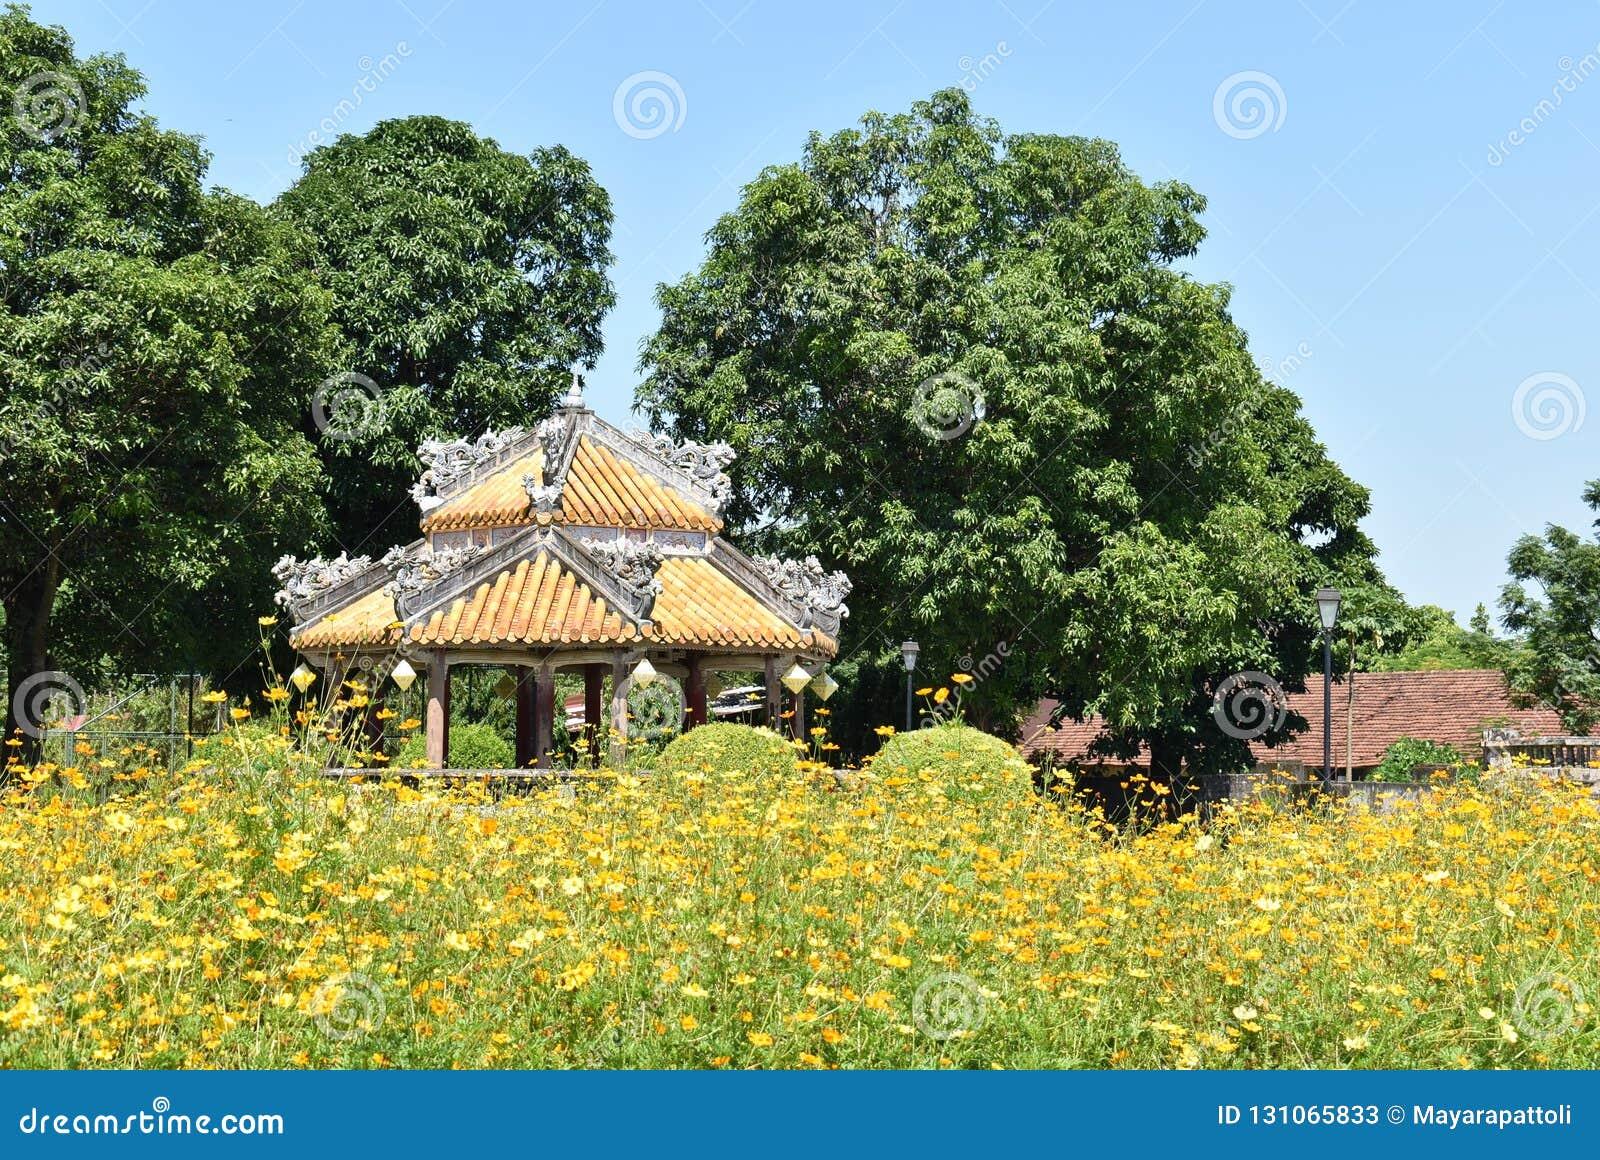 Красивый желтый сад во Вьетнаме